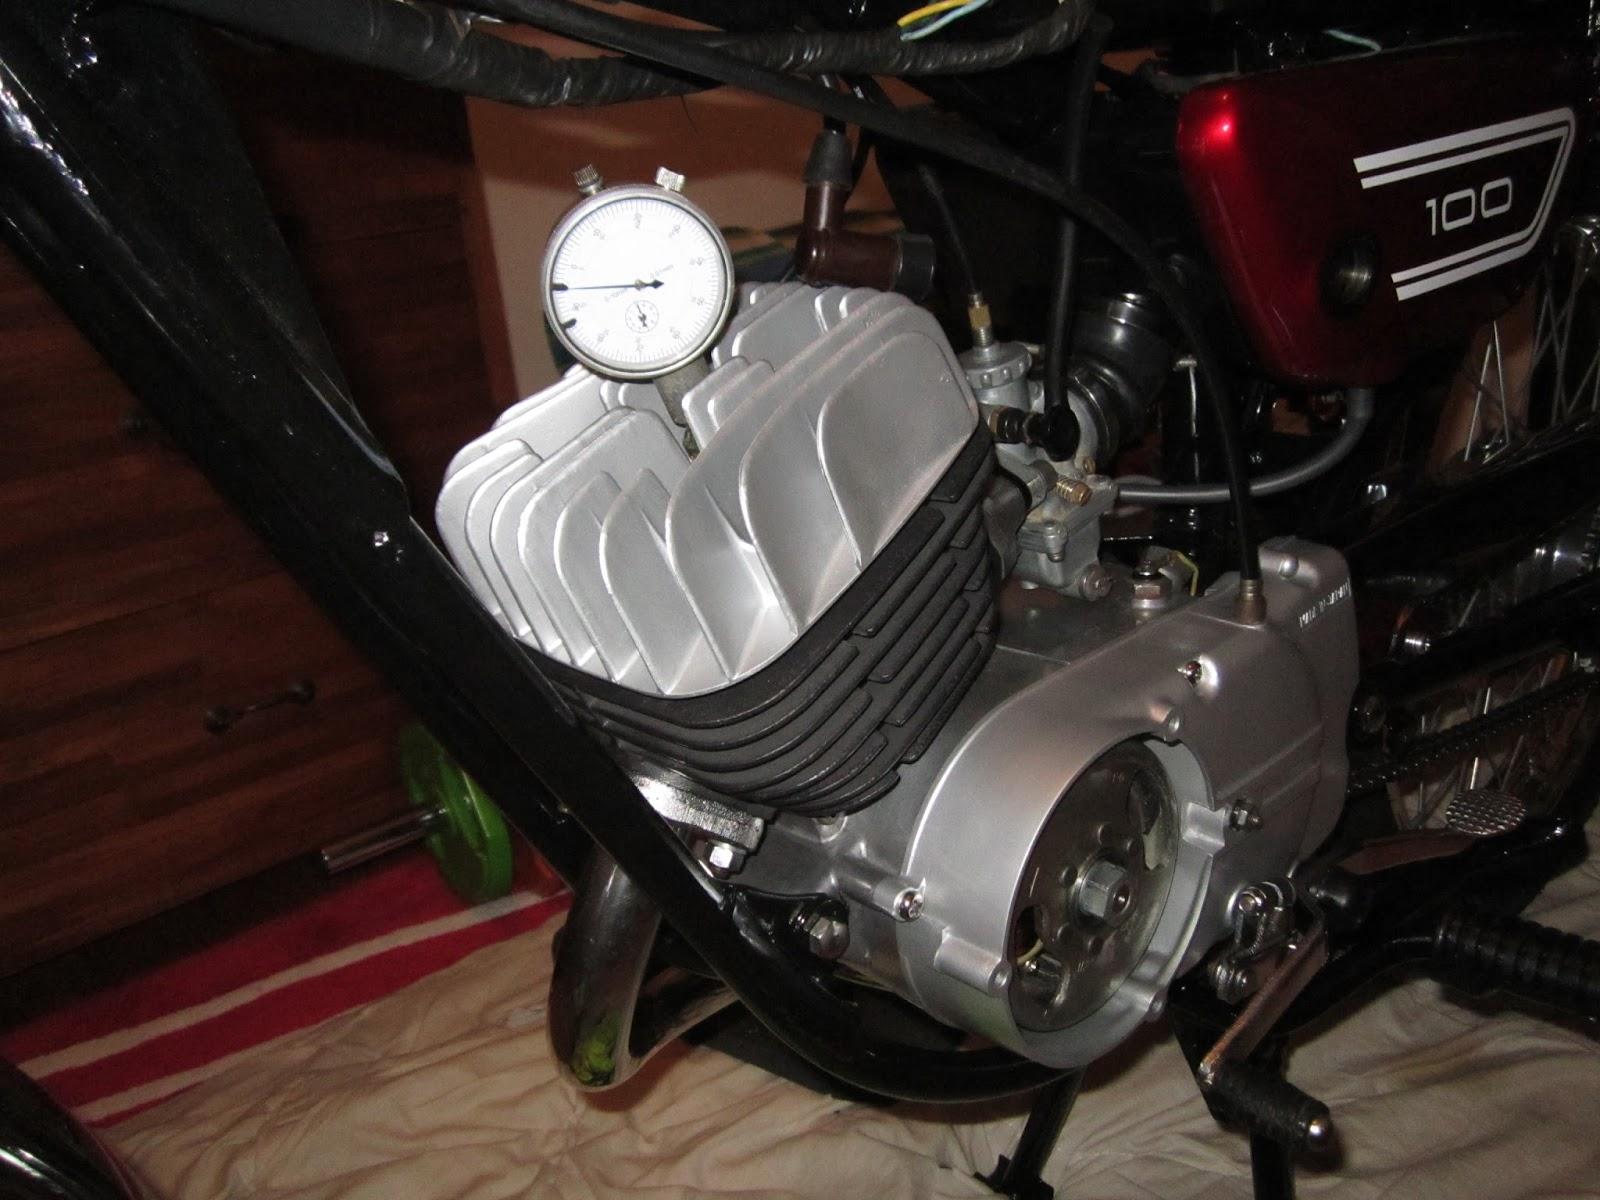 Restoration Yamaha LS3 1972: Ignition timing Yamaha two stroke